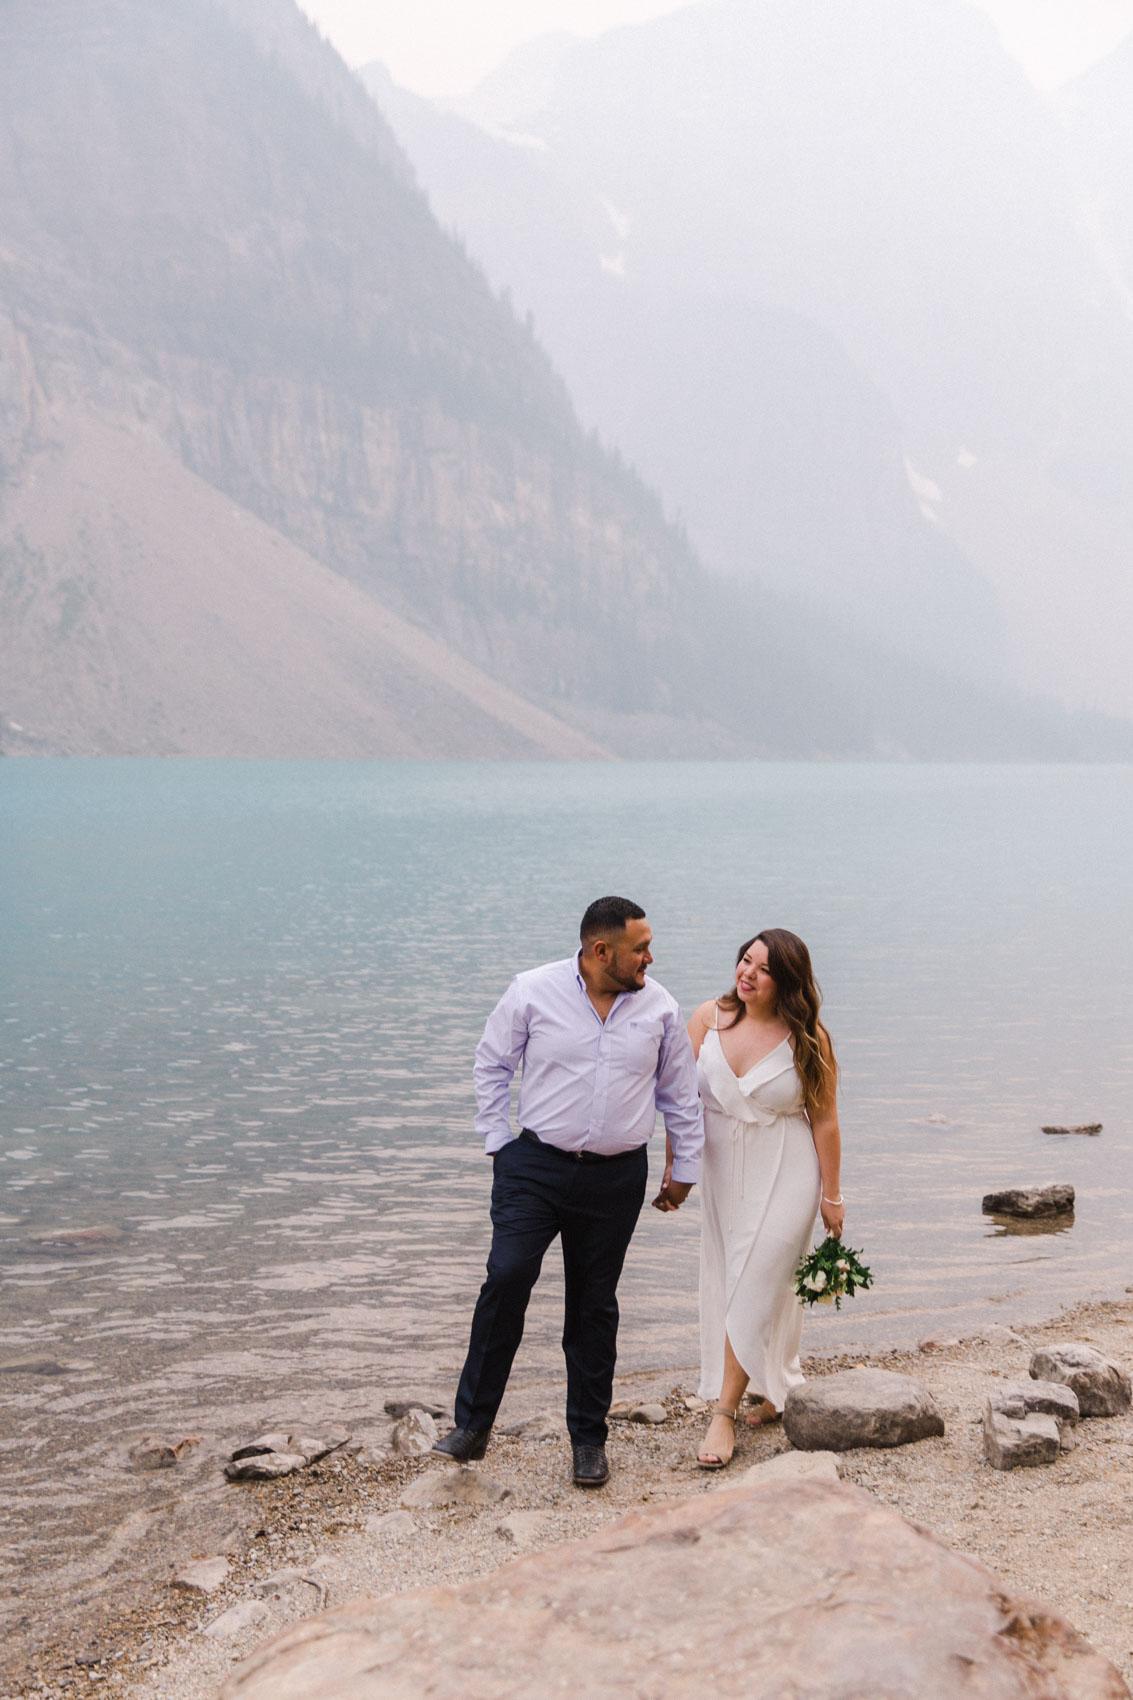 Lake Louise Mountain Engagement Photographer Moraine Lake Wedding Jennie Guenard Photography-17.jpg